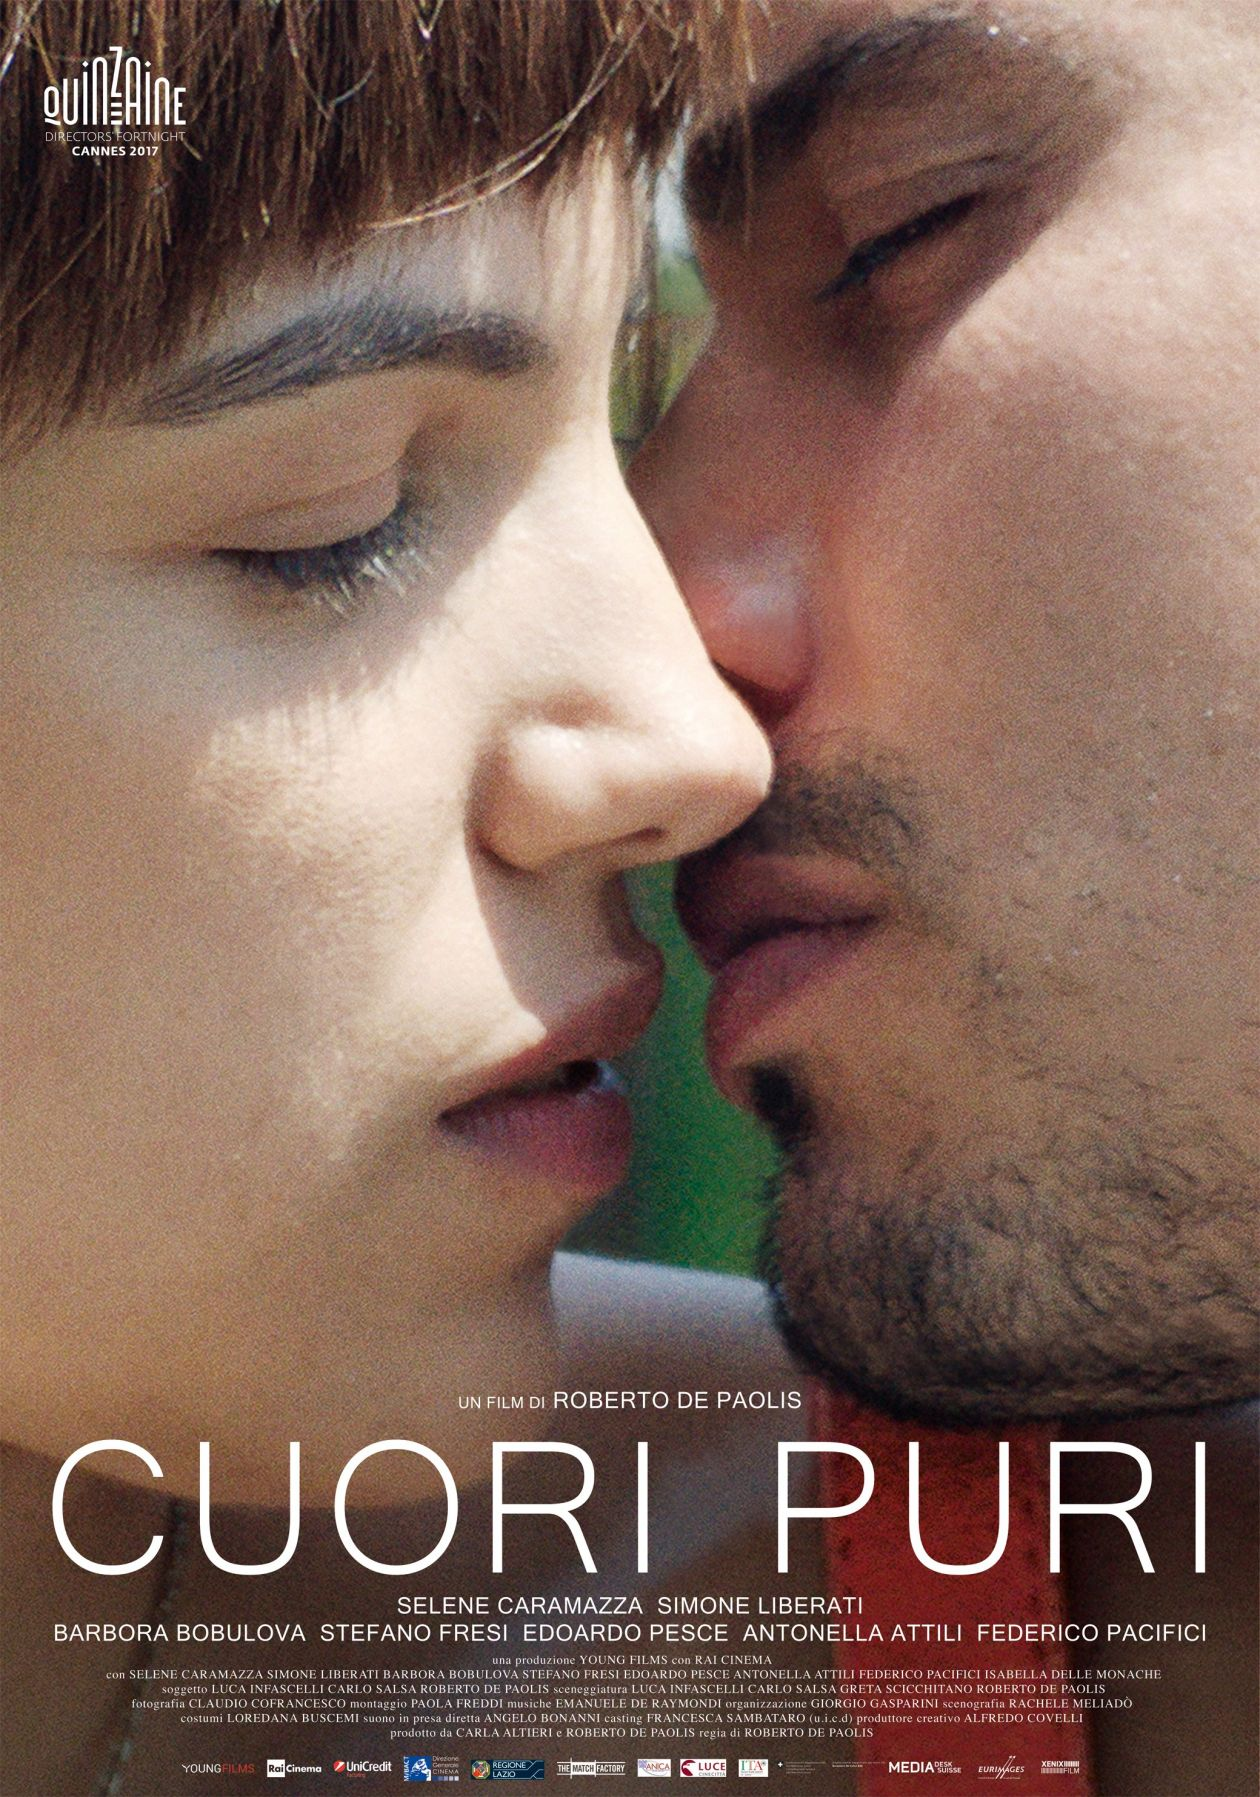 Selene Caramazza Italian actress | Cuori puri / Coeurs purs / Roberto De Paolis 2017 / Movie Poster / Affiche film